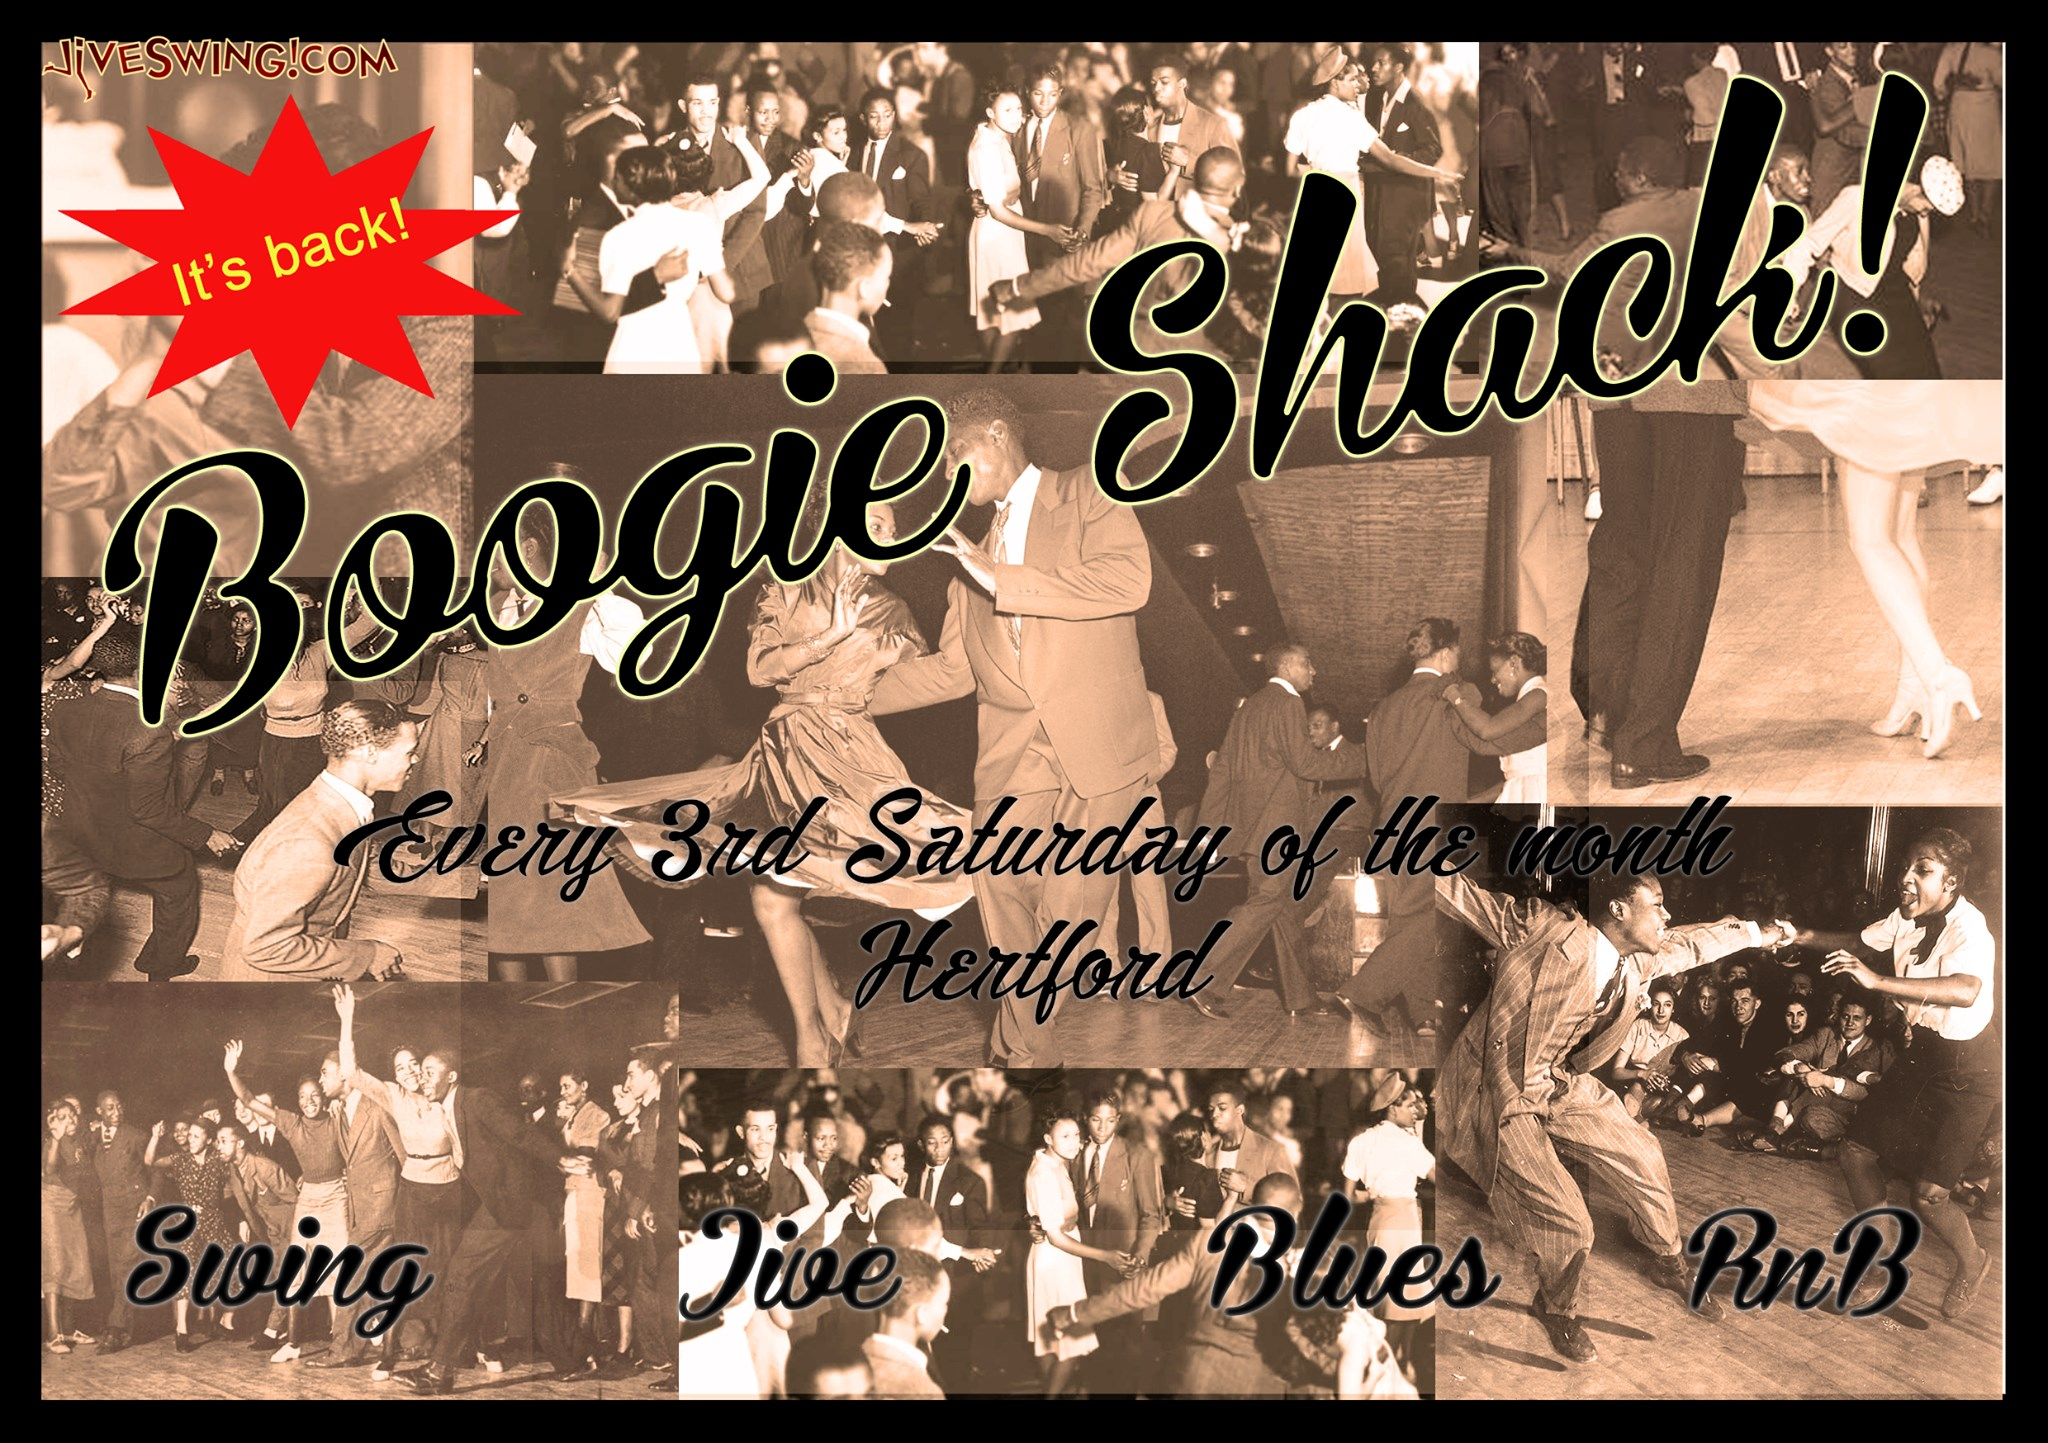 Boogie Shack Social Dancing Hertford